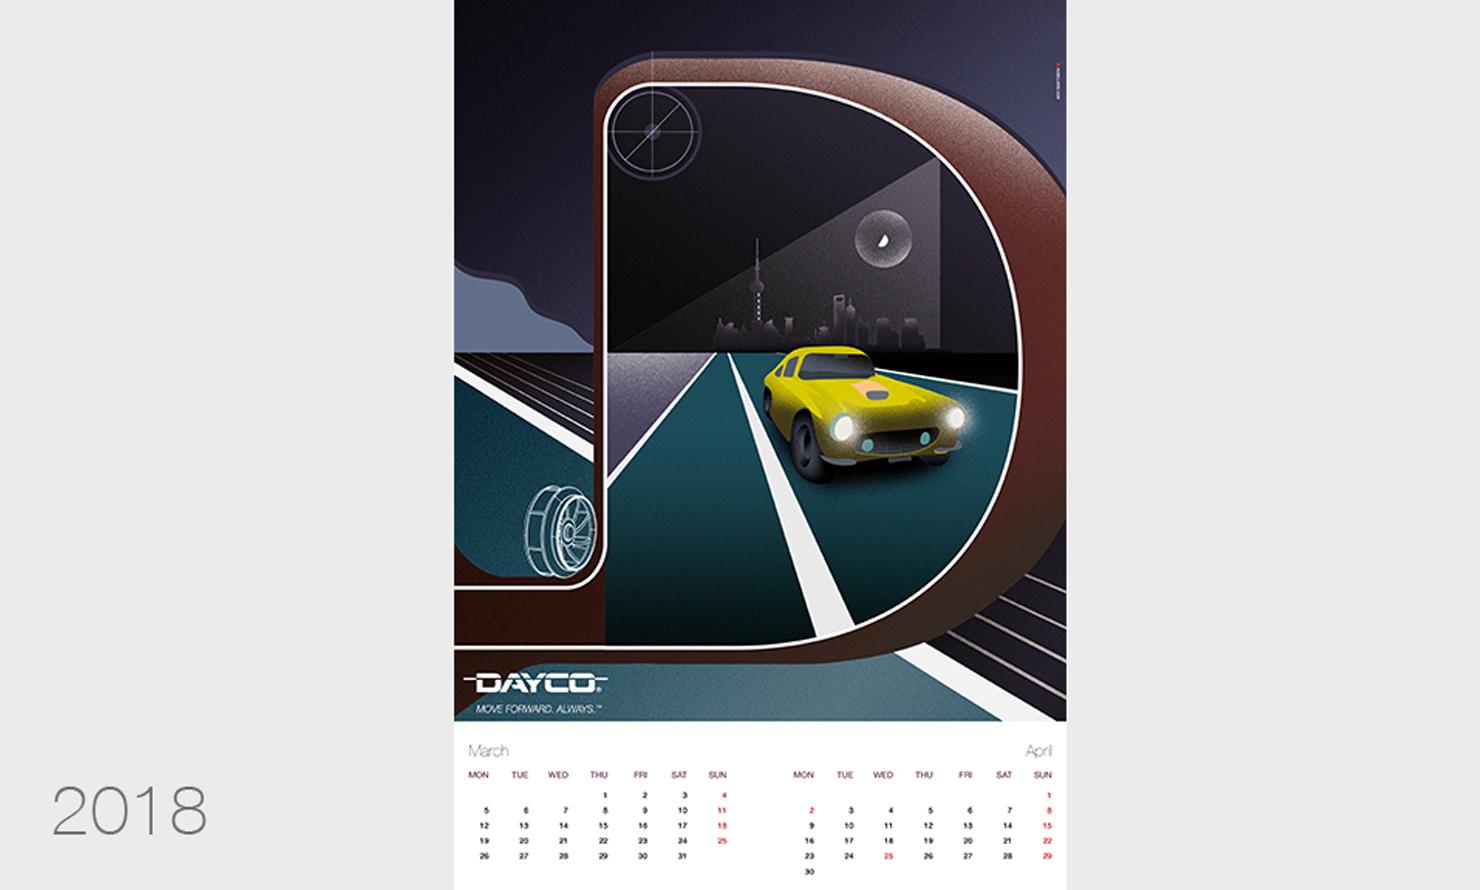 https://kubelibre.com/uploads/Slider-work-tutti-clienti/dayco-calendario-2018-2.jpg